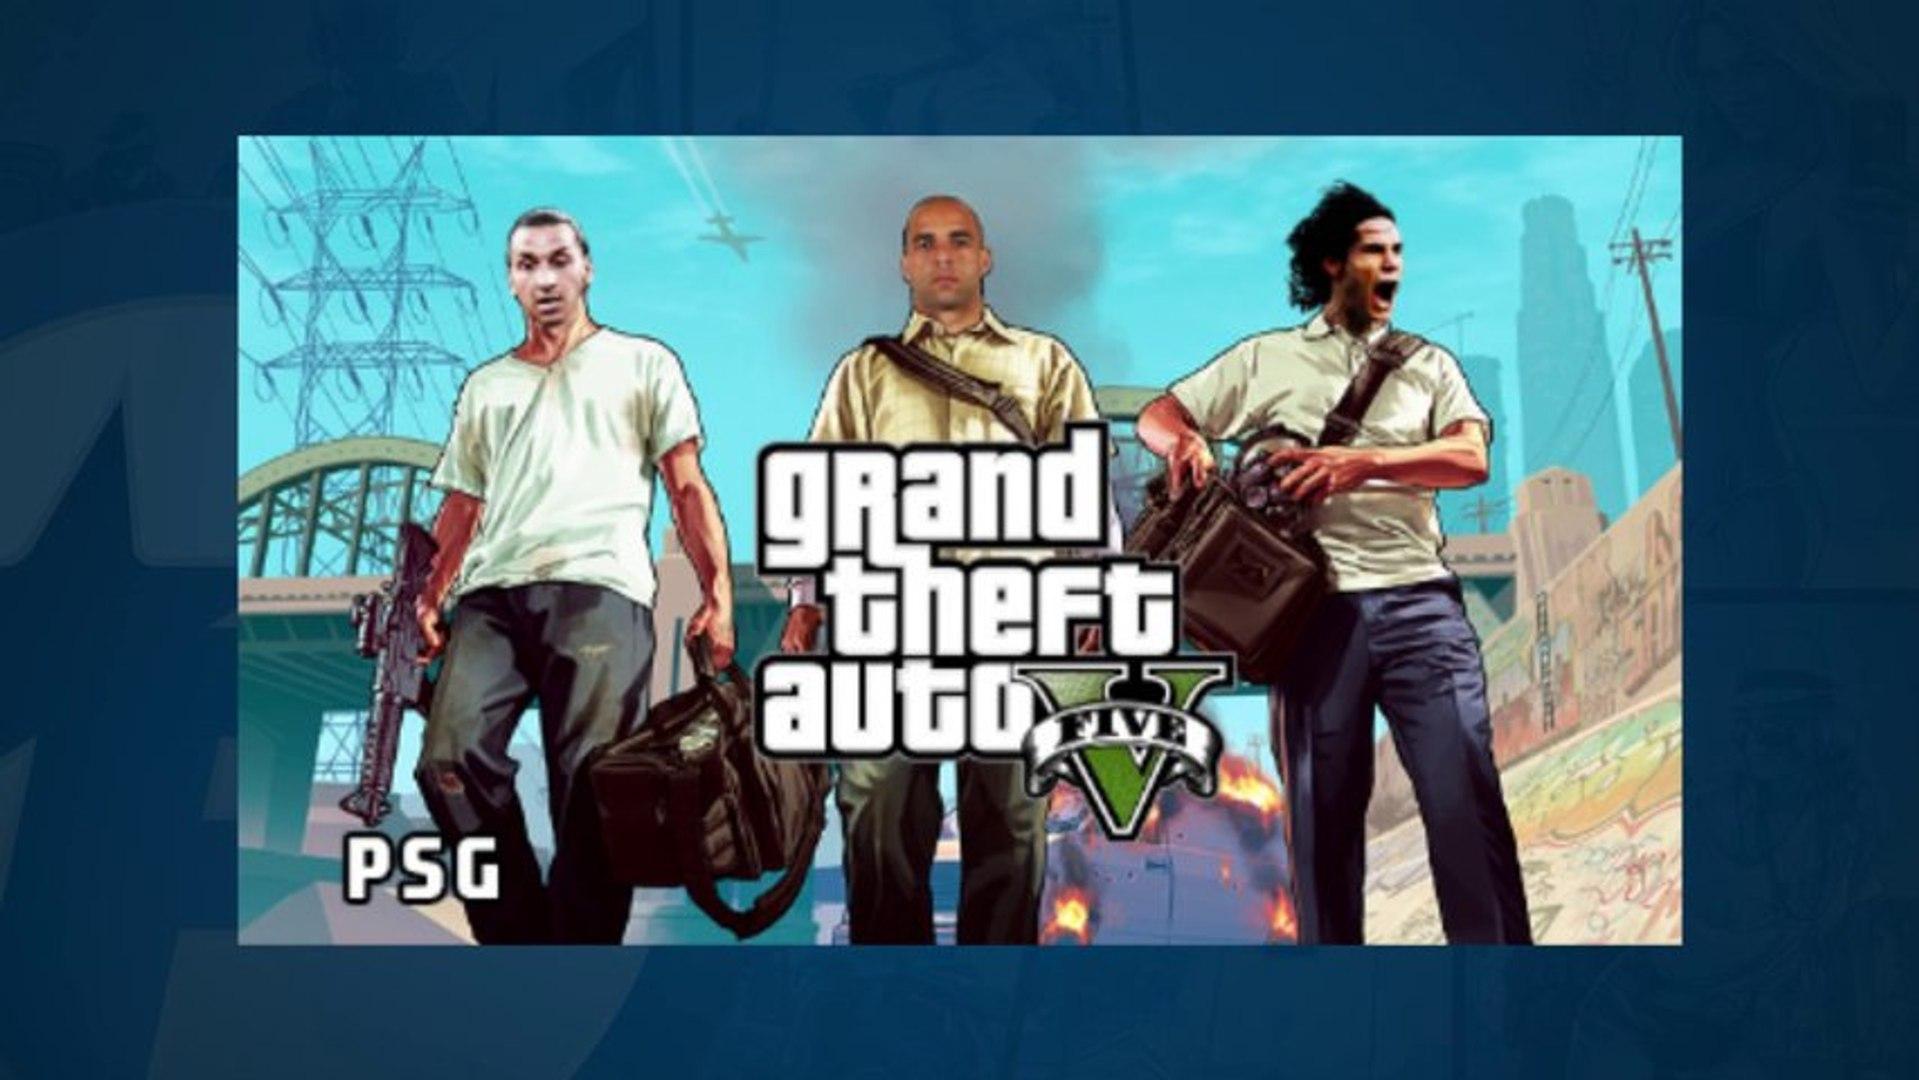 GTA V : les parodies foot envahissent la toile !